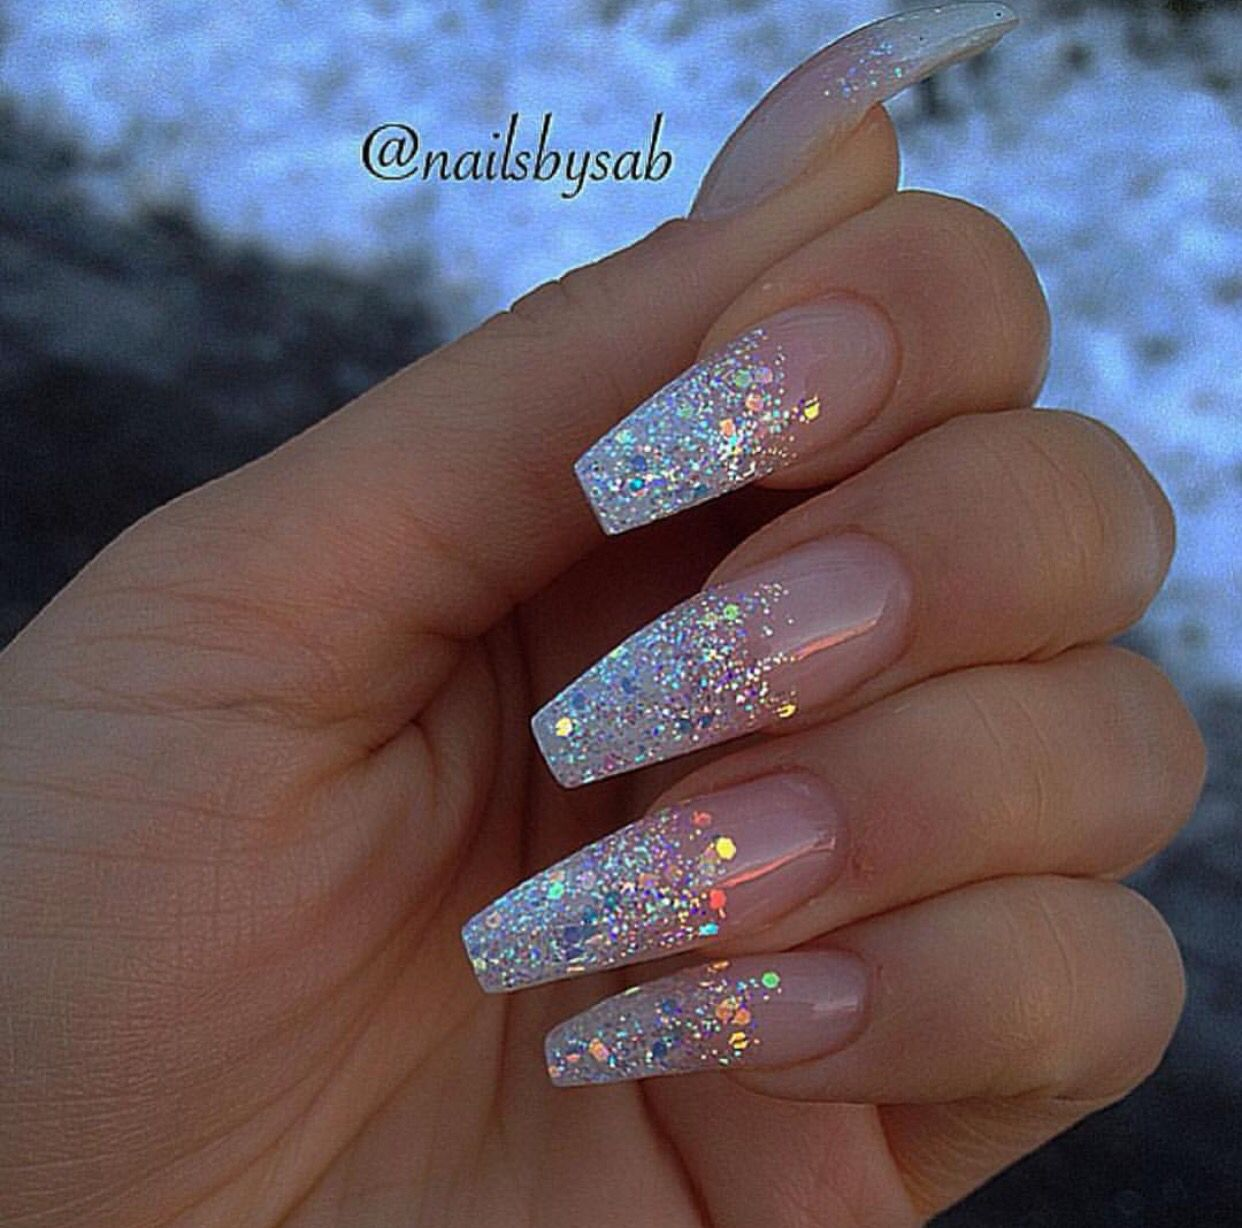 These nails are everyyyyything nails pinterest nail nail